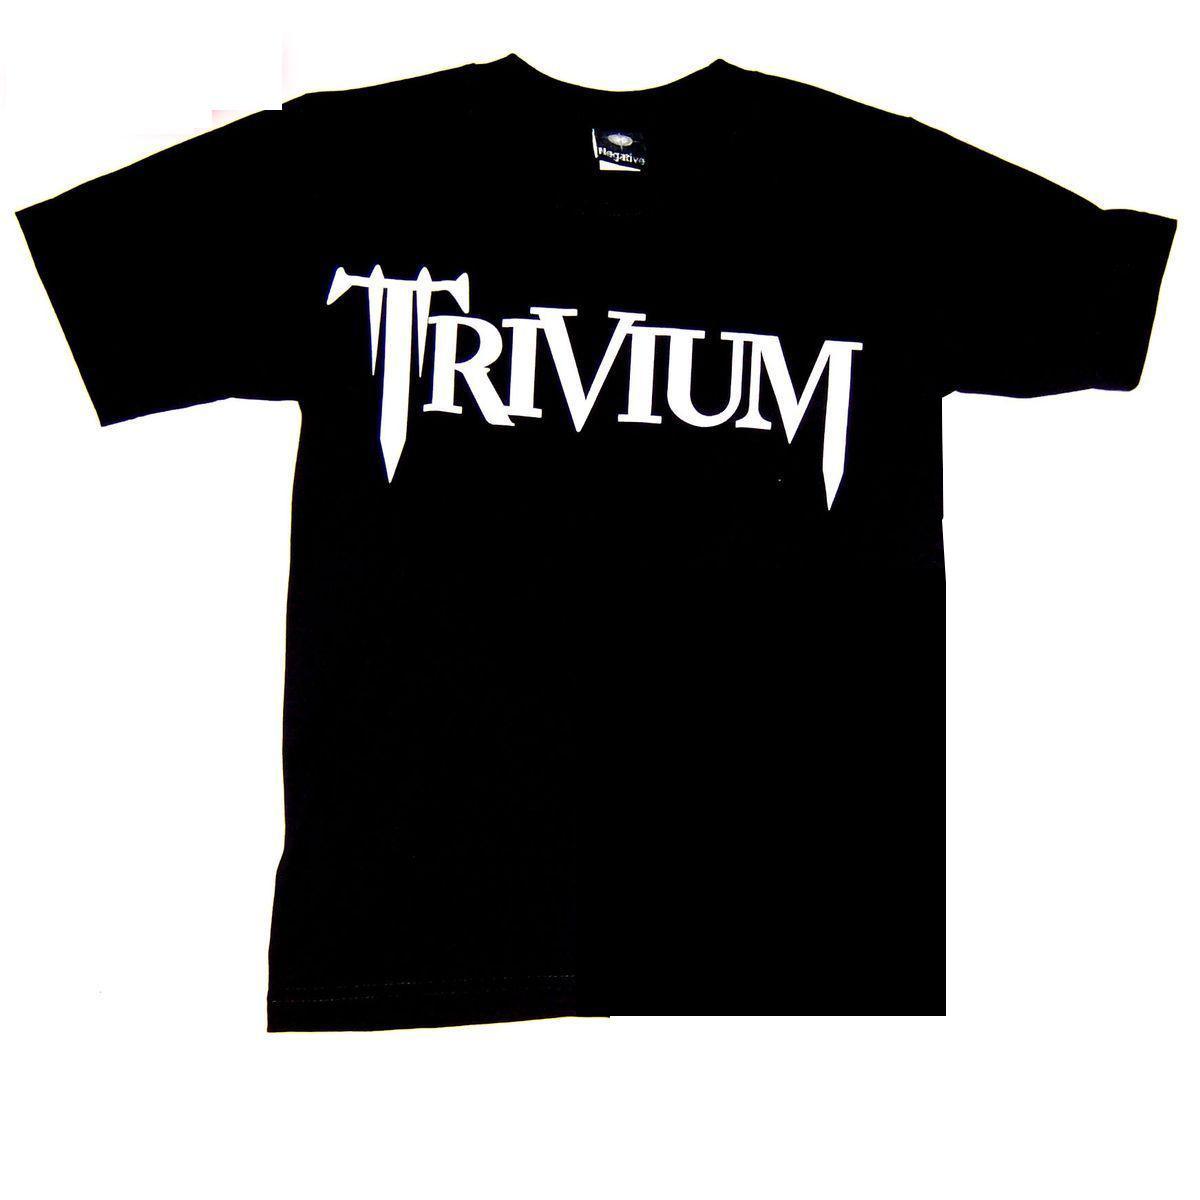 Trivium - Klassisch - Band-T-Shirt Shirts